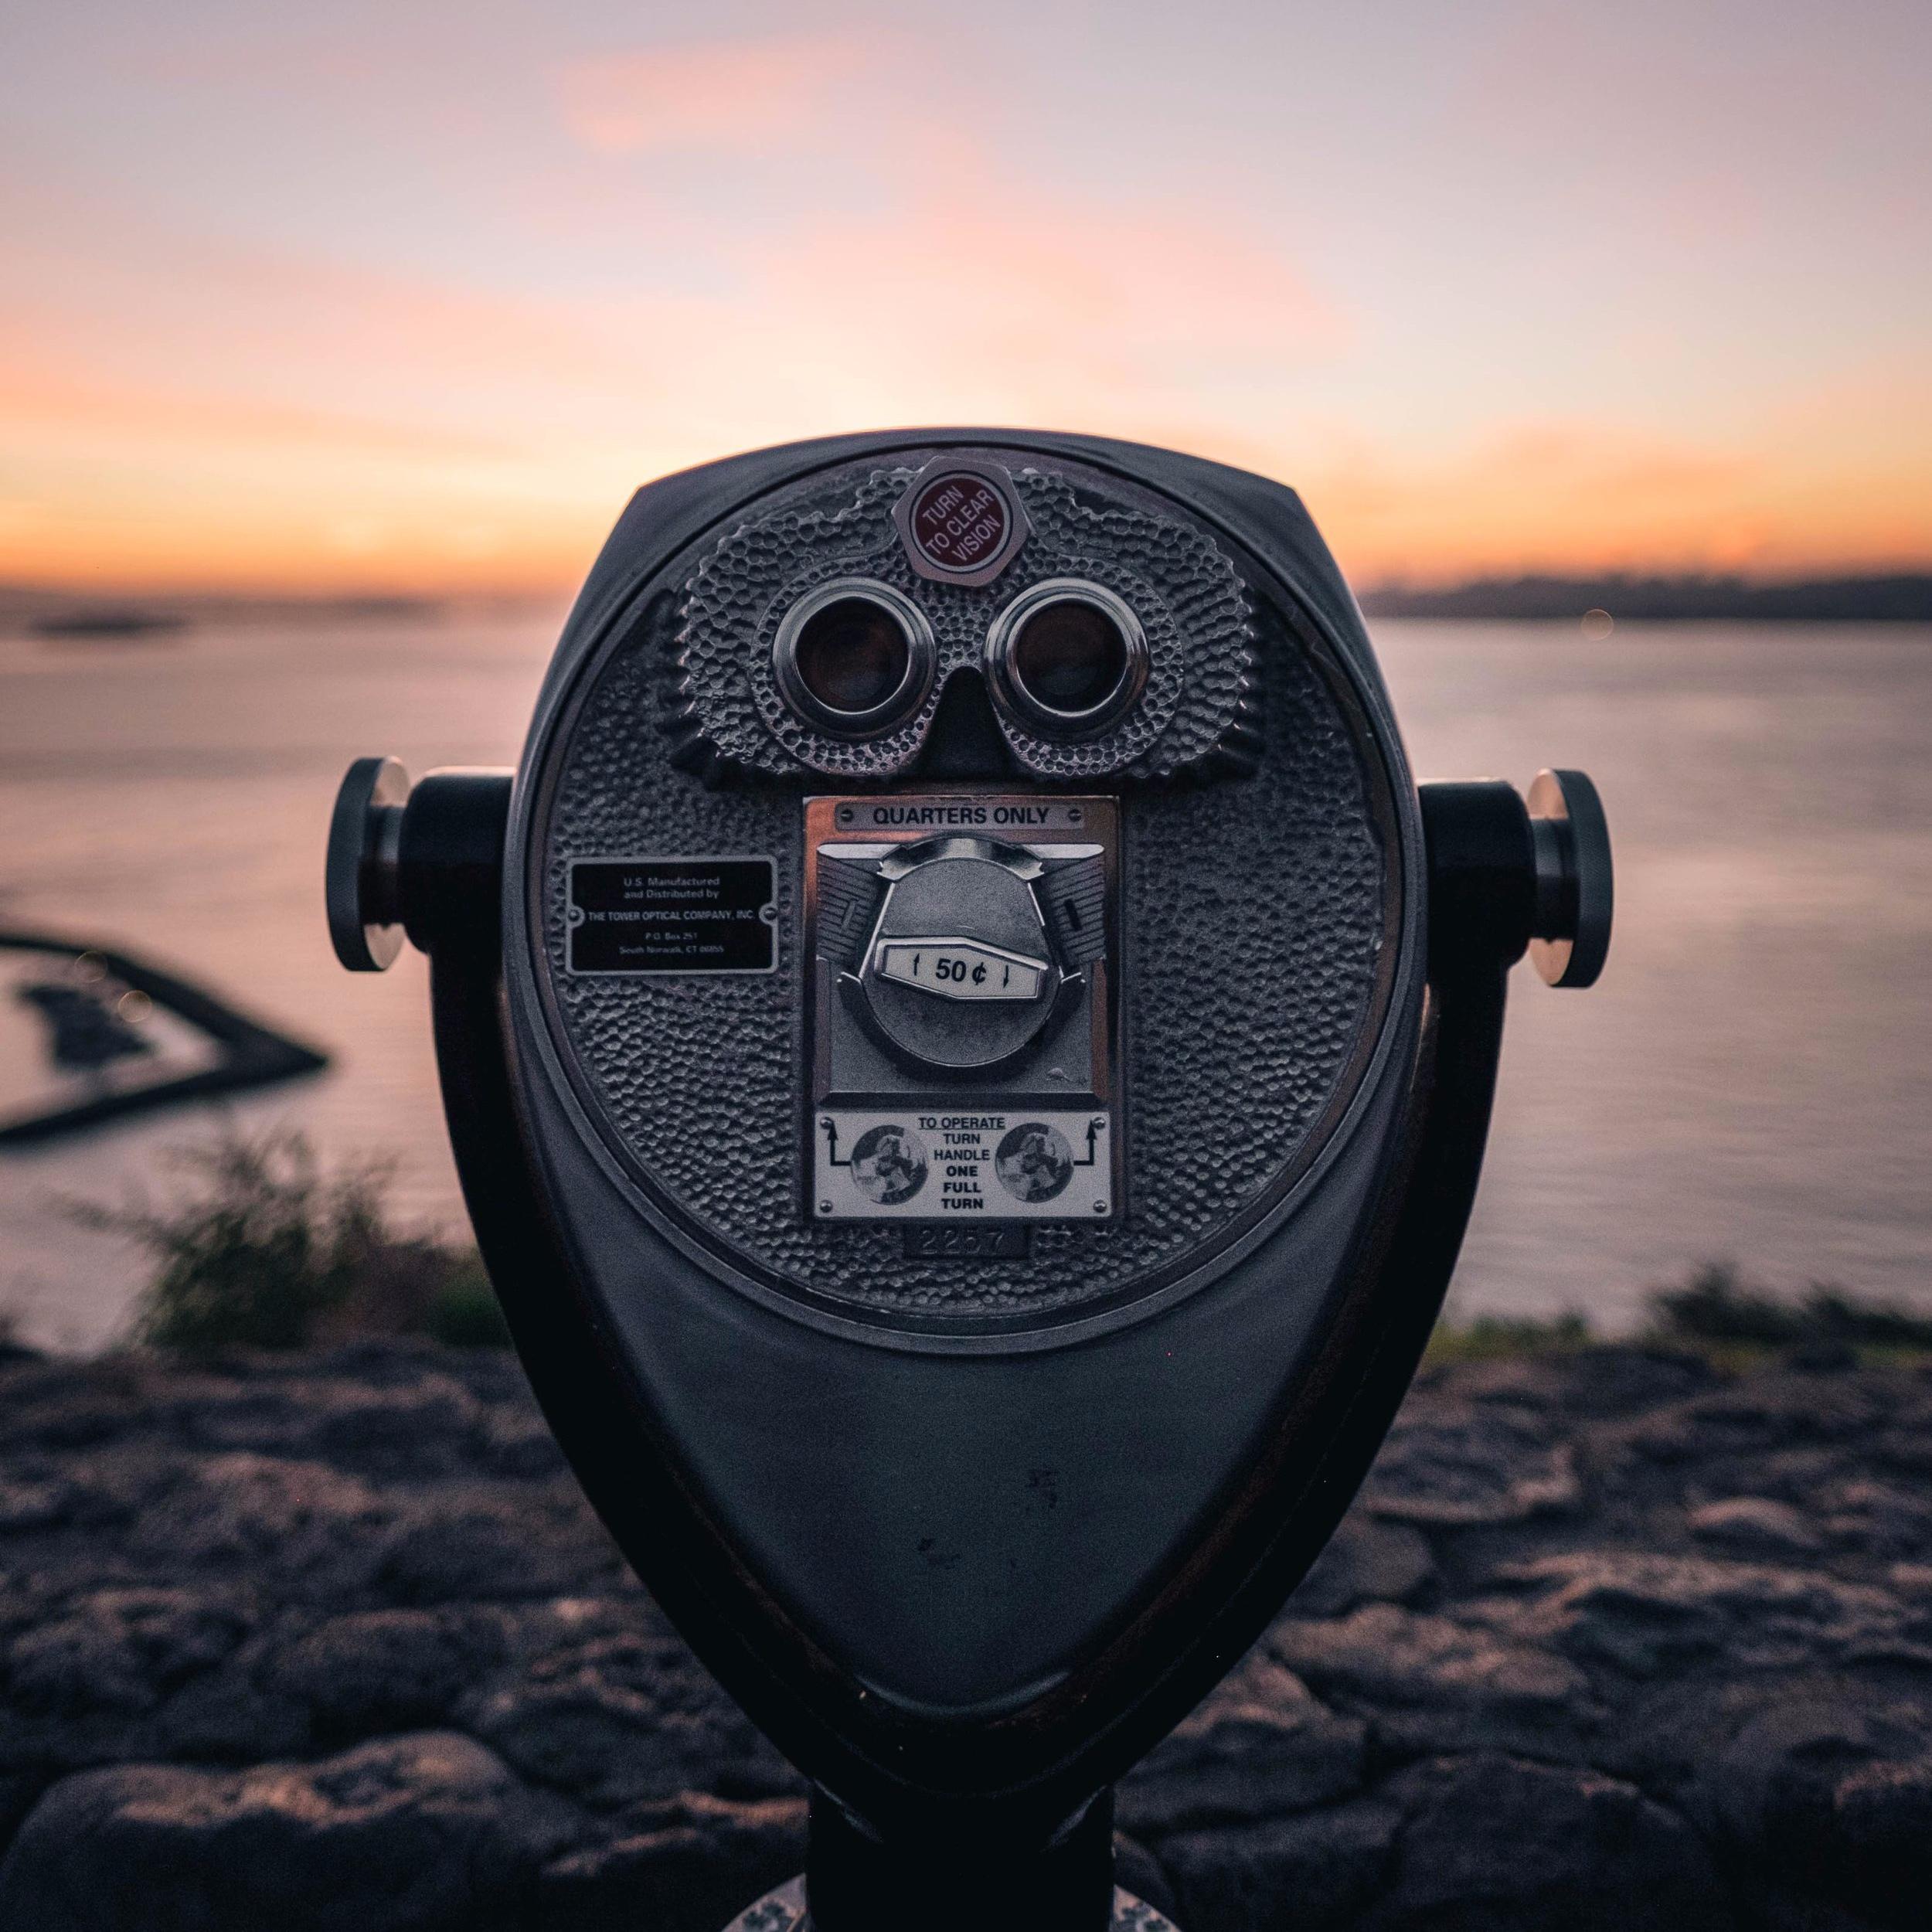 landscape-viewing-binoculars.jpg